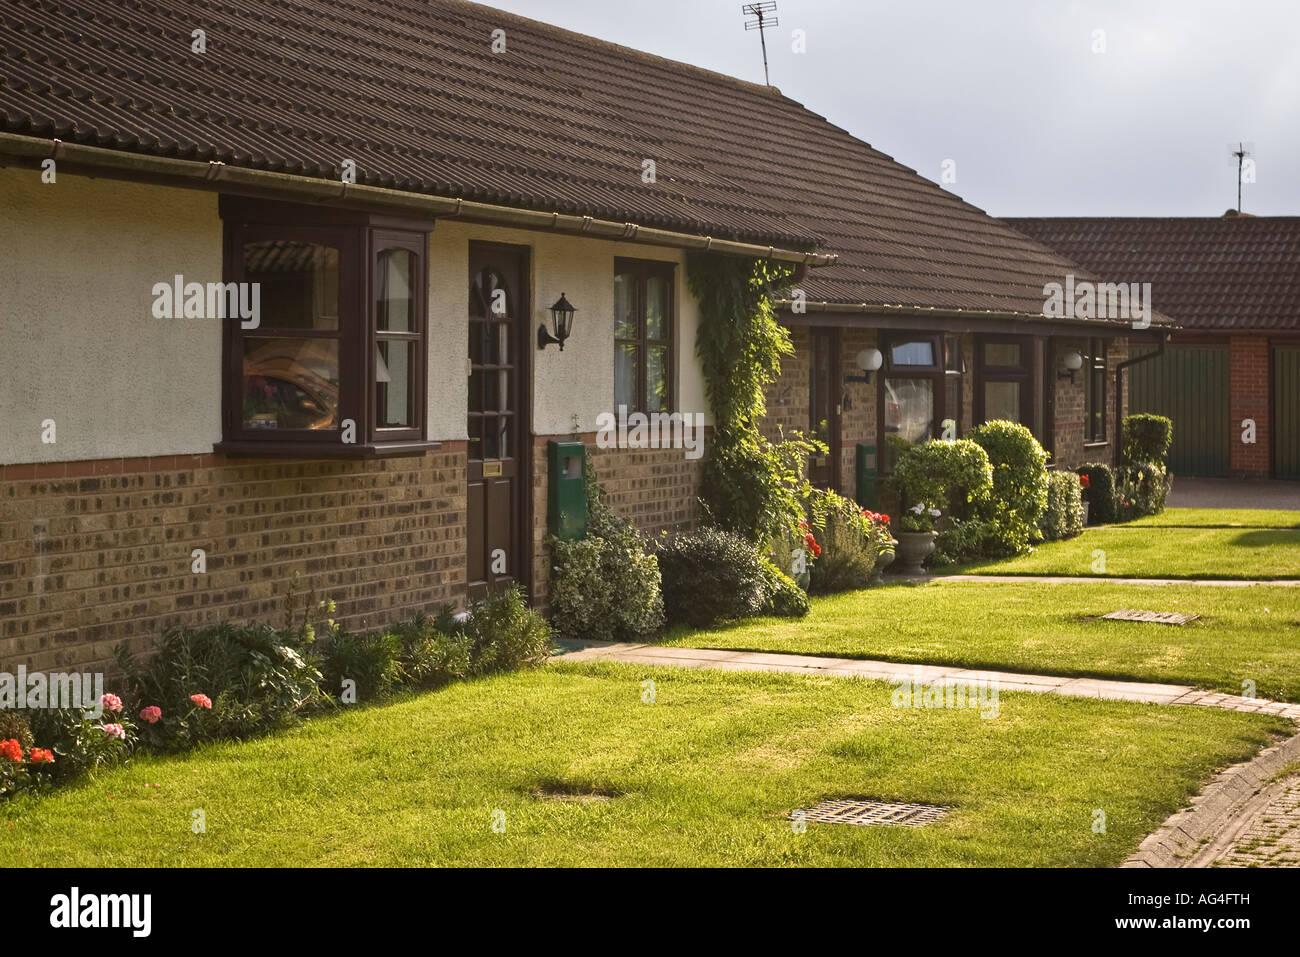 Retirement Bungalows In Purpose Built Retirement Village   Stock Image